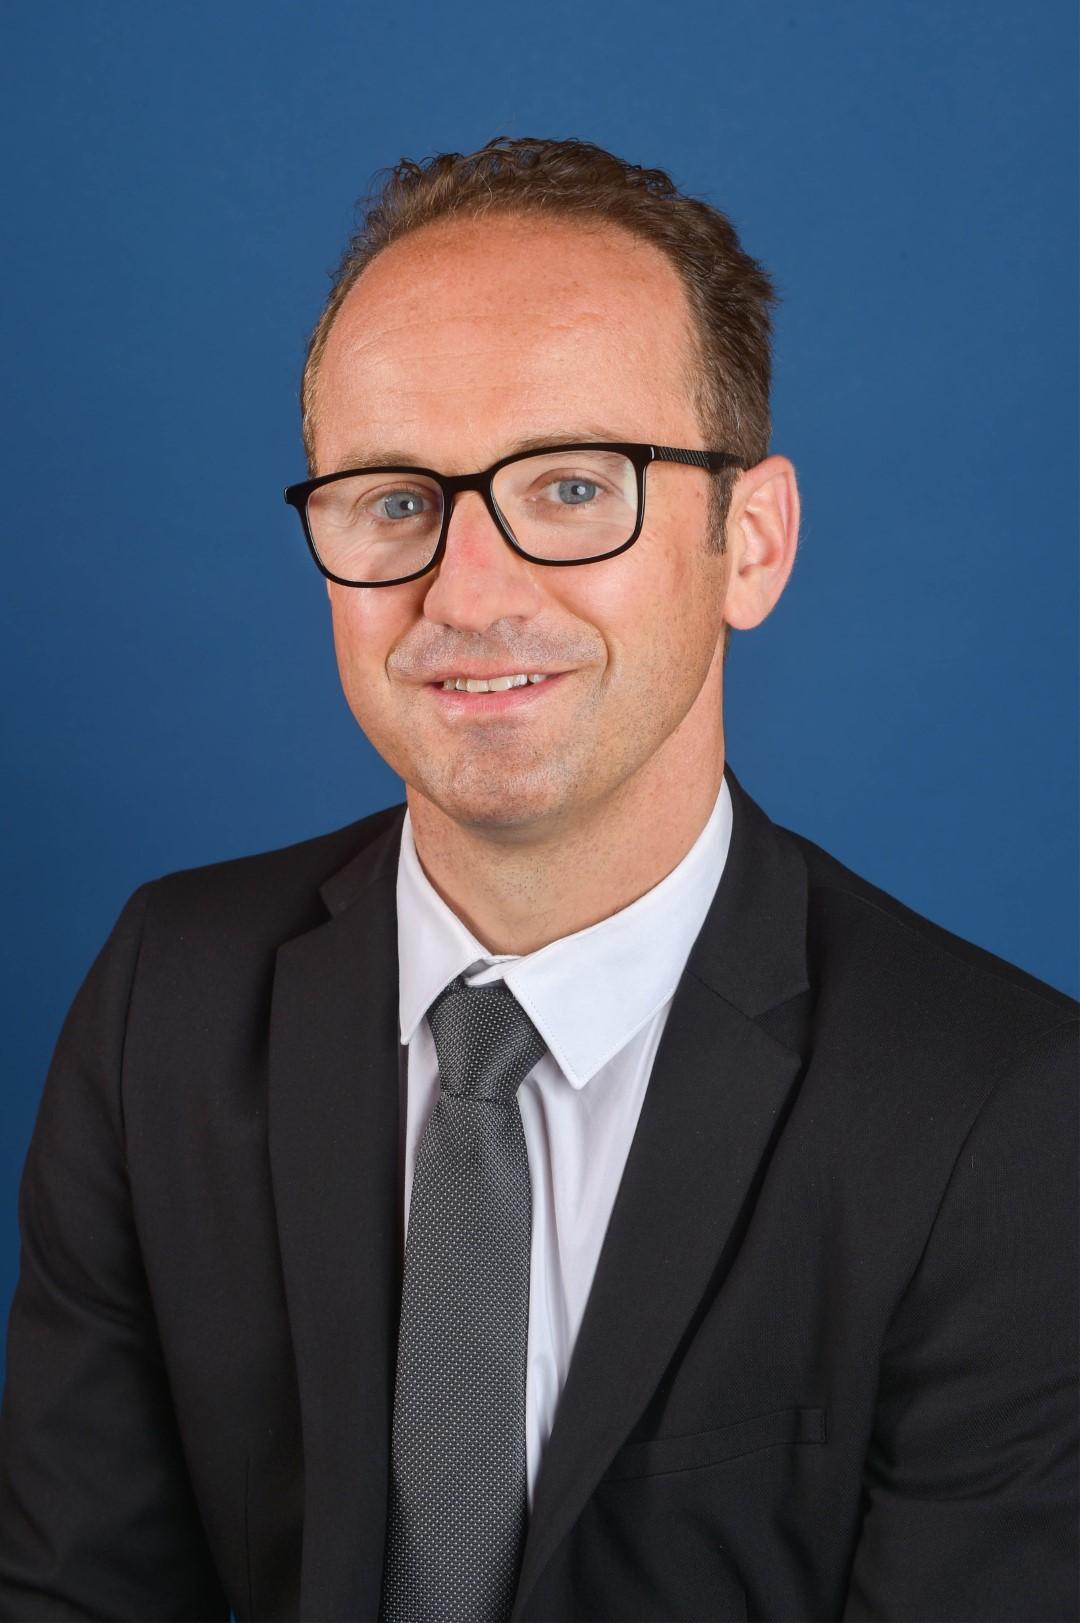 Sylvain COUFFIGNAL